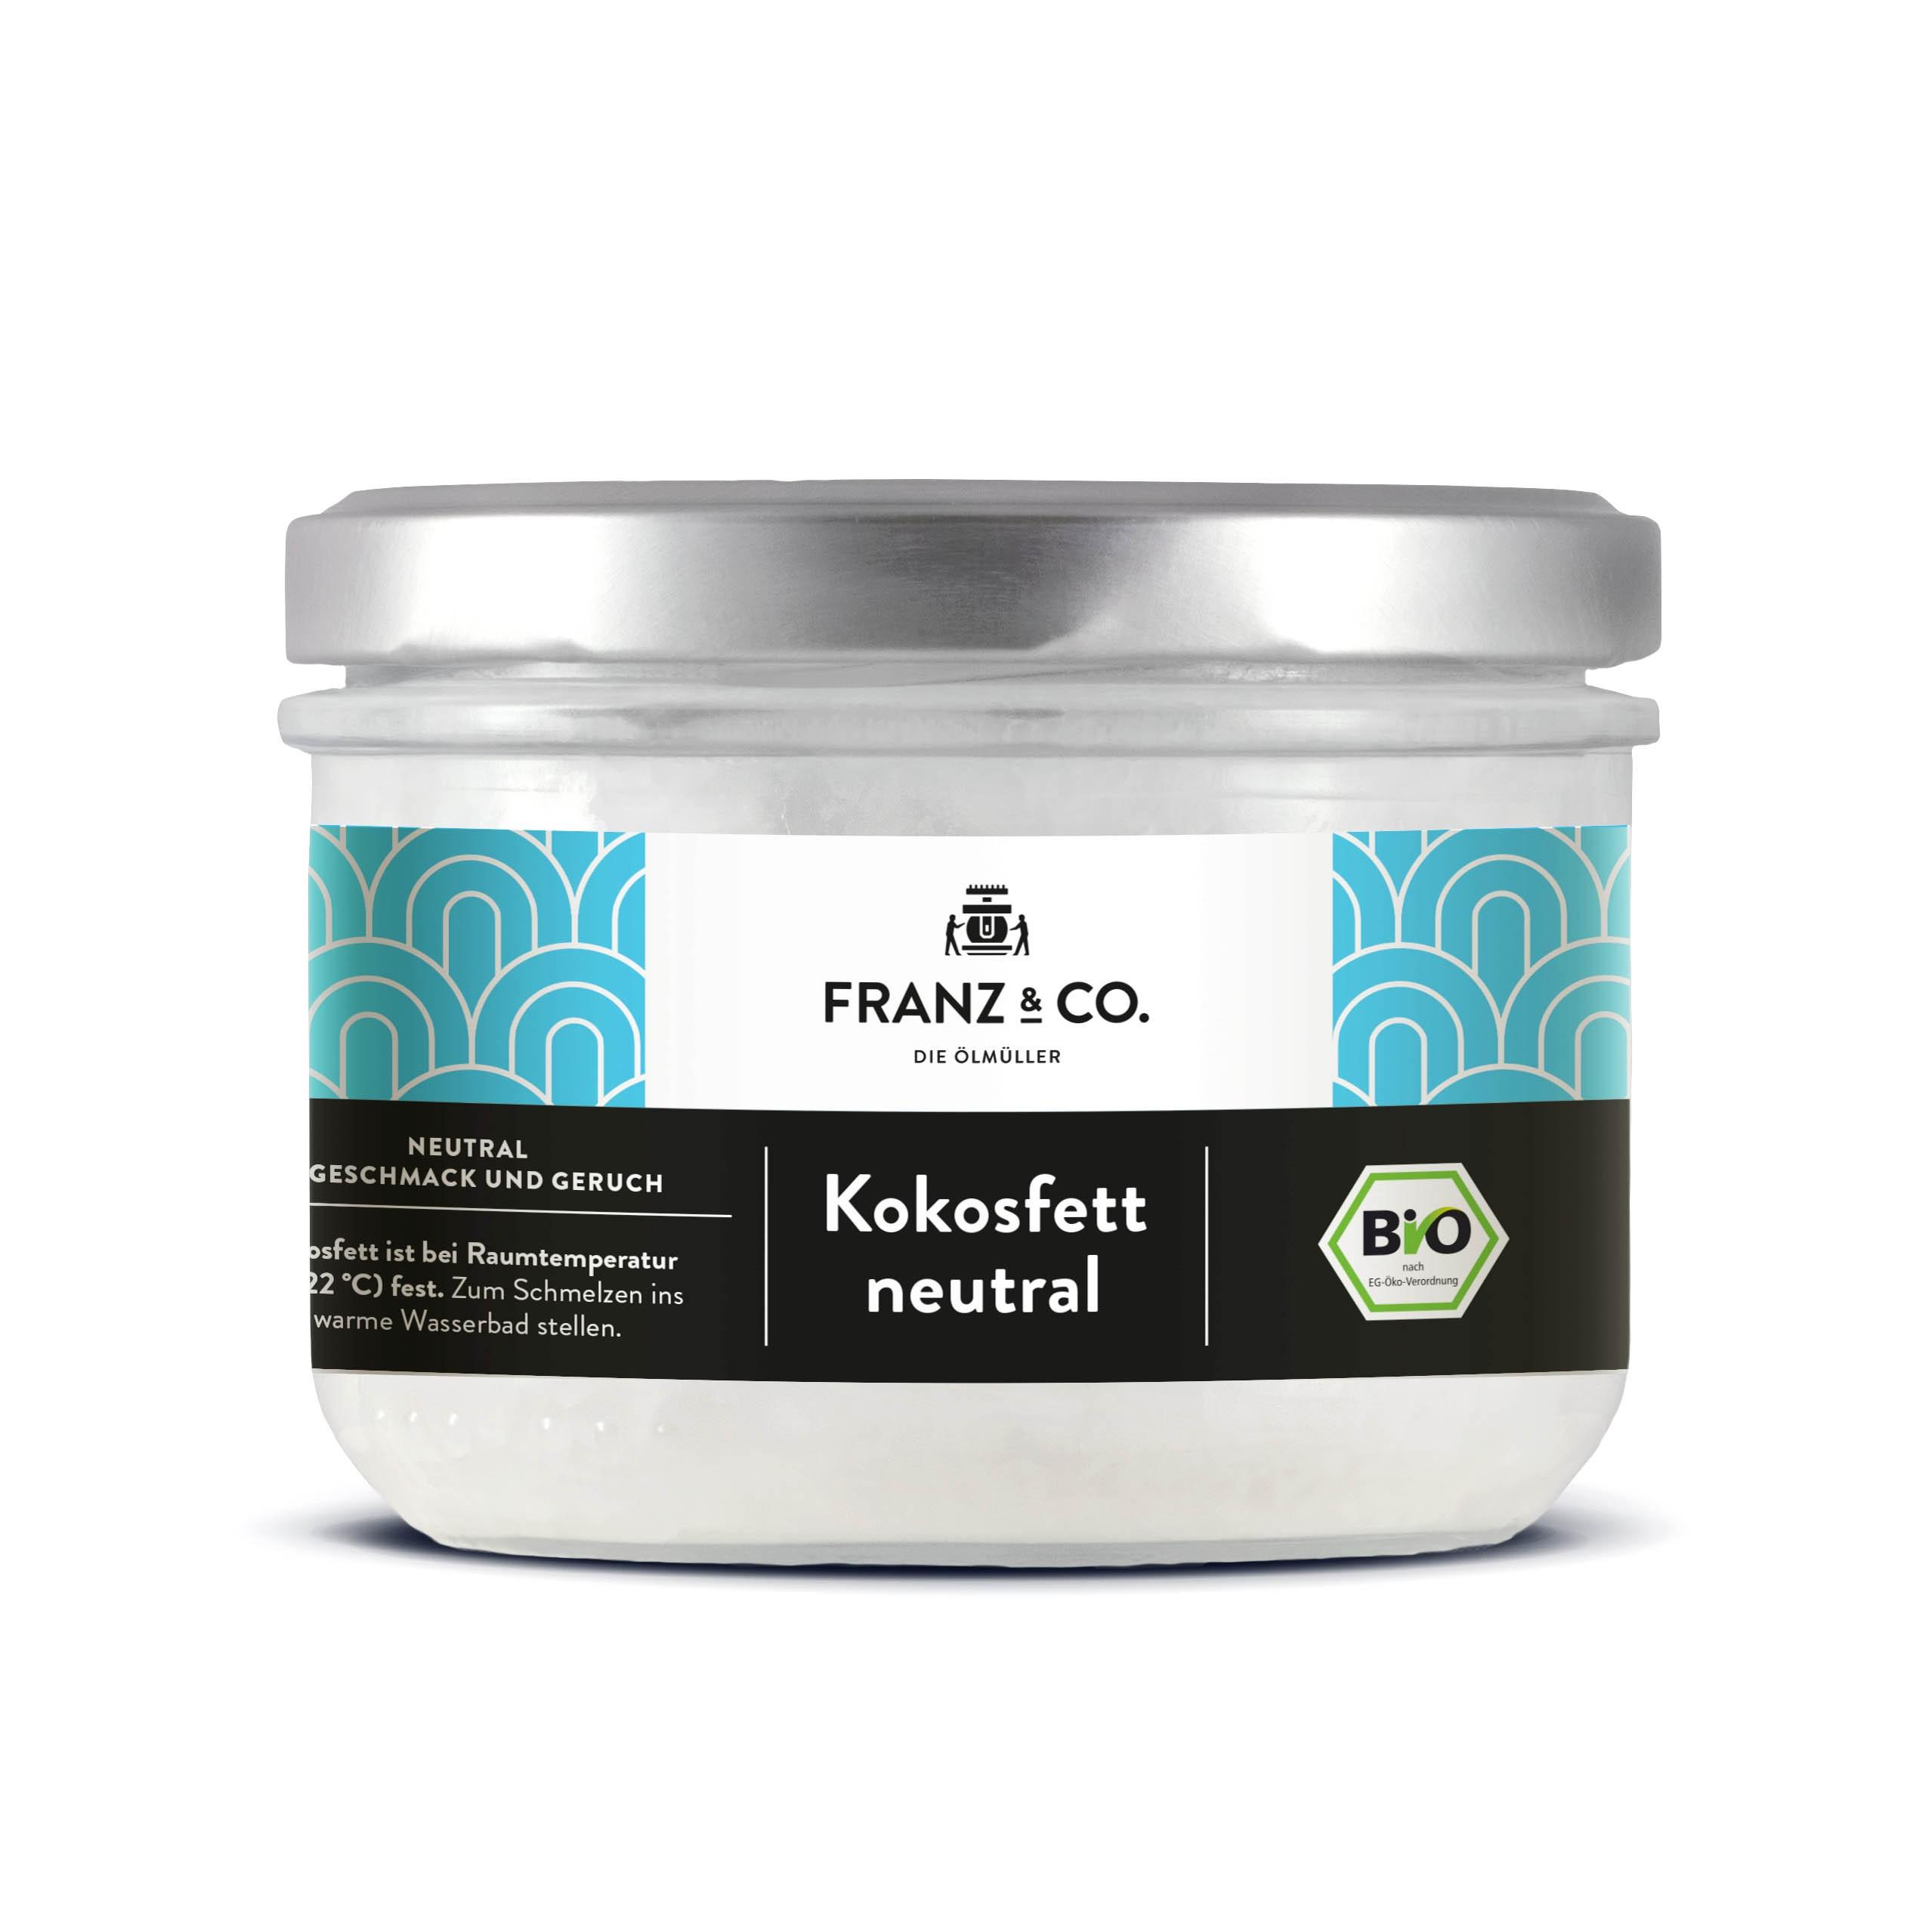 Franz & Co BIO Kokosfett, neutral 200ml